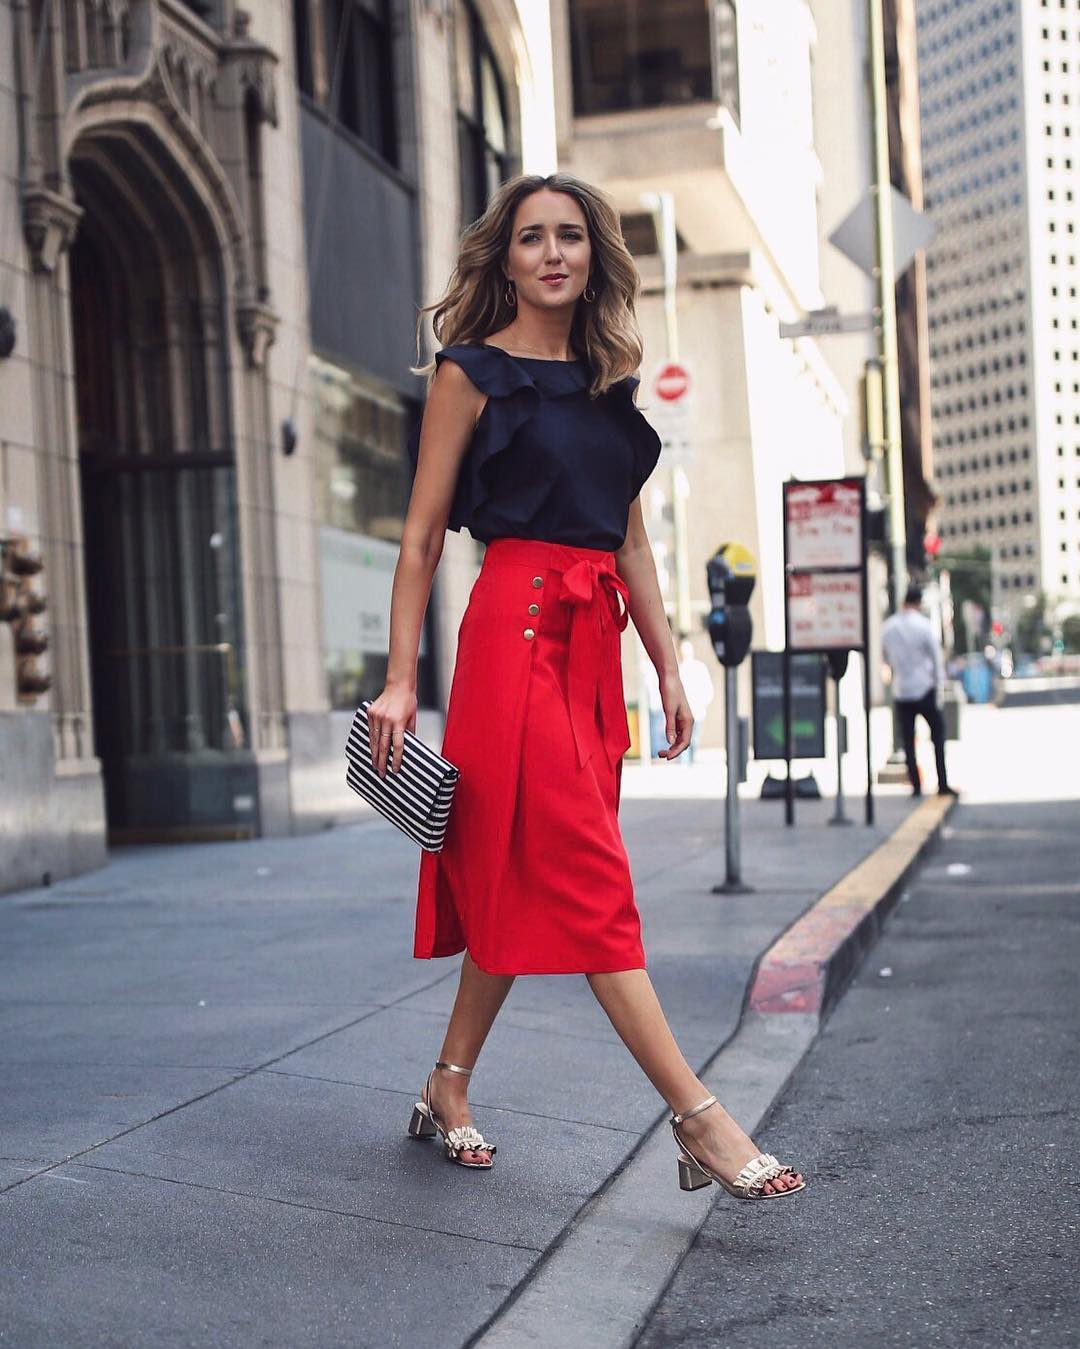 красная юбка + черная блузка фото 1